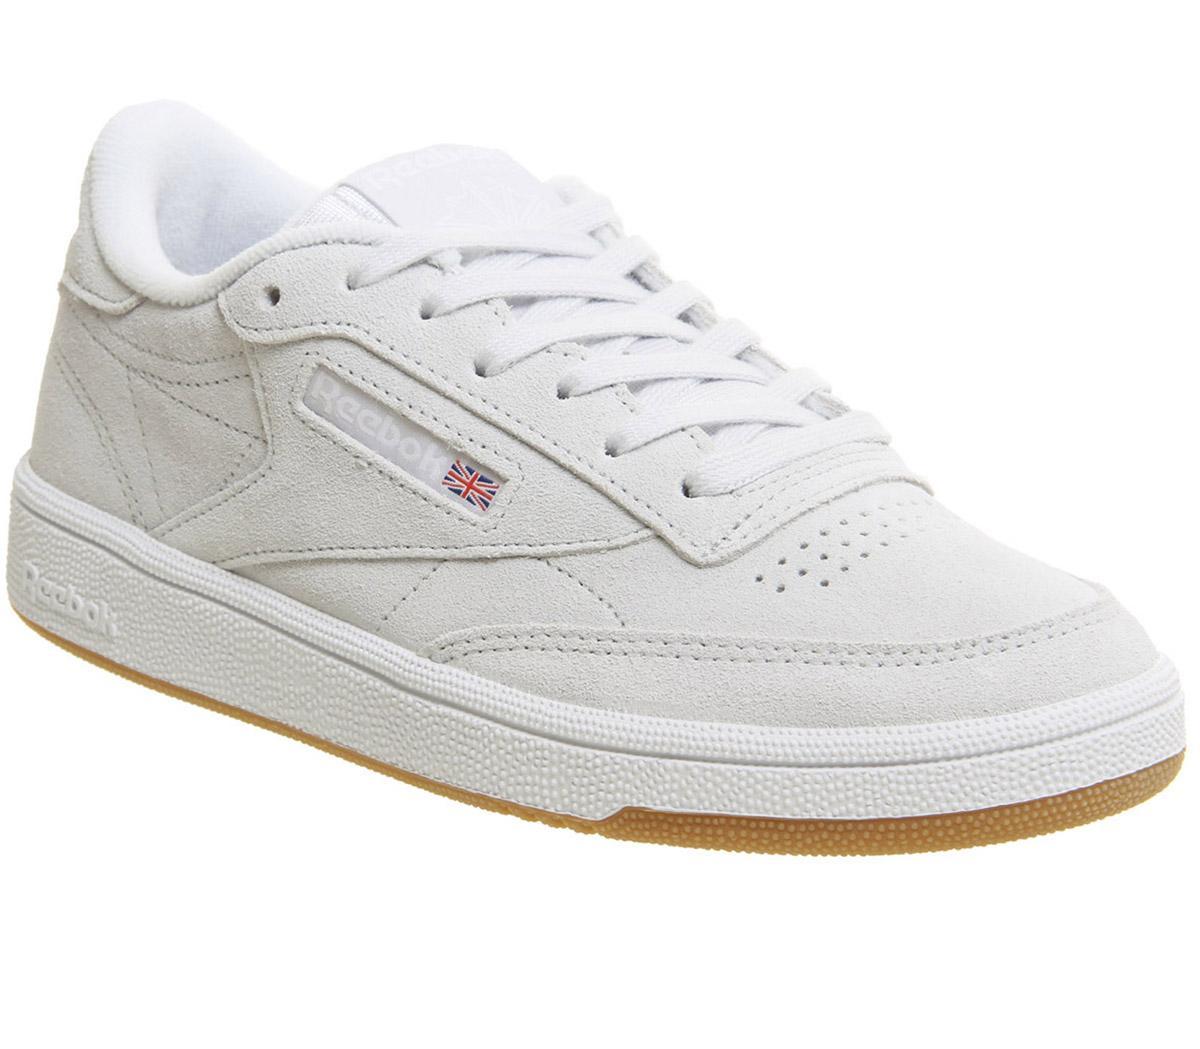 Reebok Club C 85 Spirit White White Gum